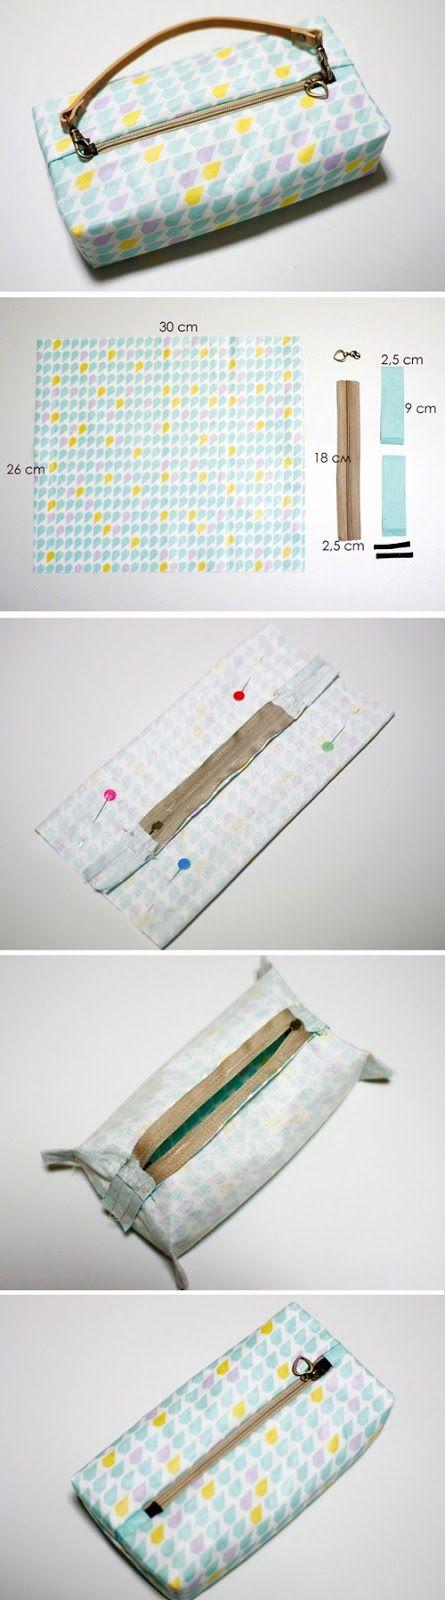 Boxy Pouch / Bag DIY tutorial with patterns.  http://www.handmadiya.com/2015/10/boxy-pouch-tutorial.html